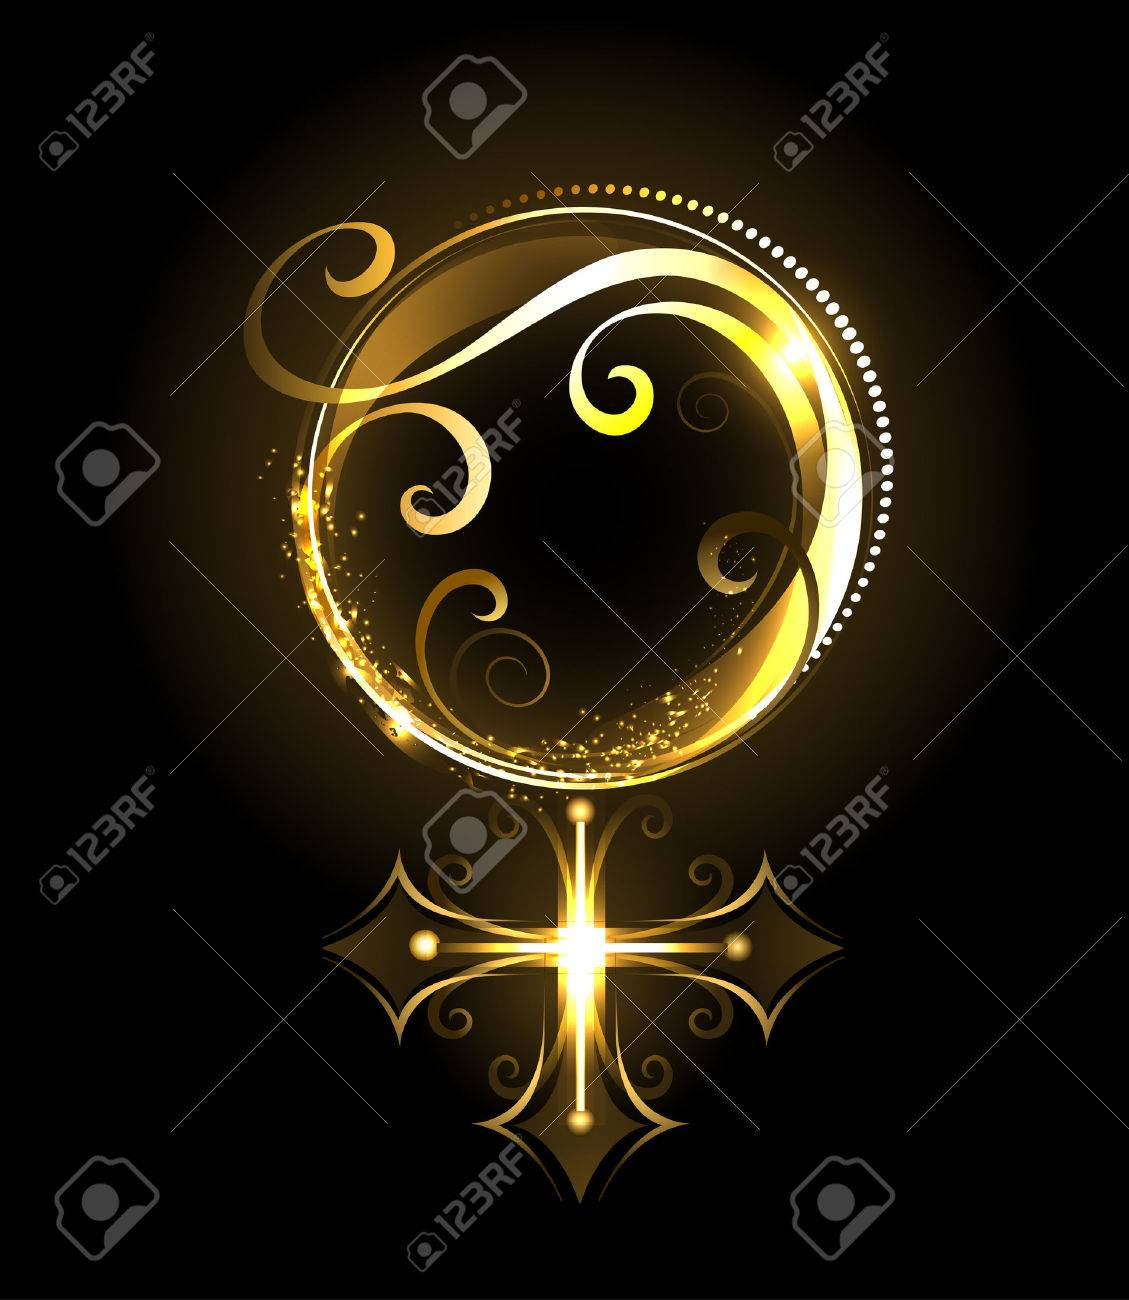 Shiny jewelry gold symbol of venus on a black background royalty shiny jewelry gold symbol of venus on a black background stockfoto 28304645 voltagebd Choice Image